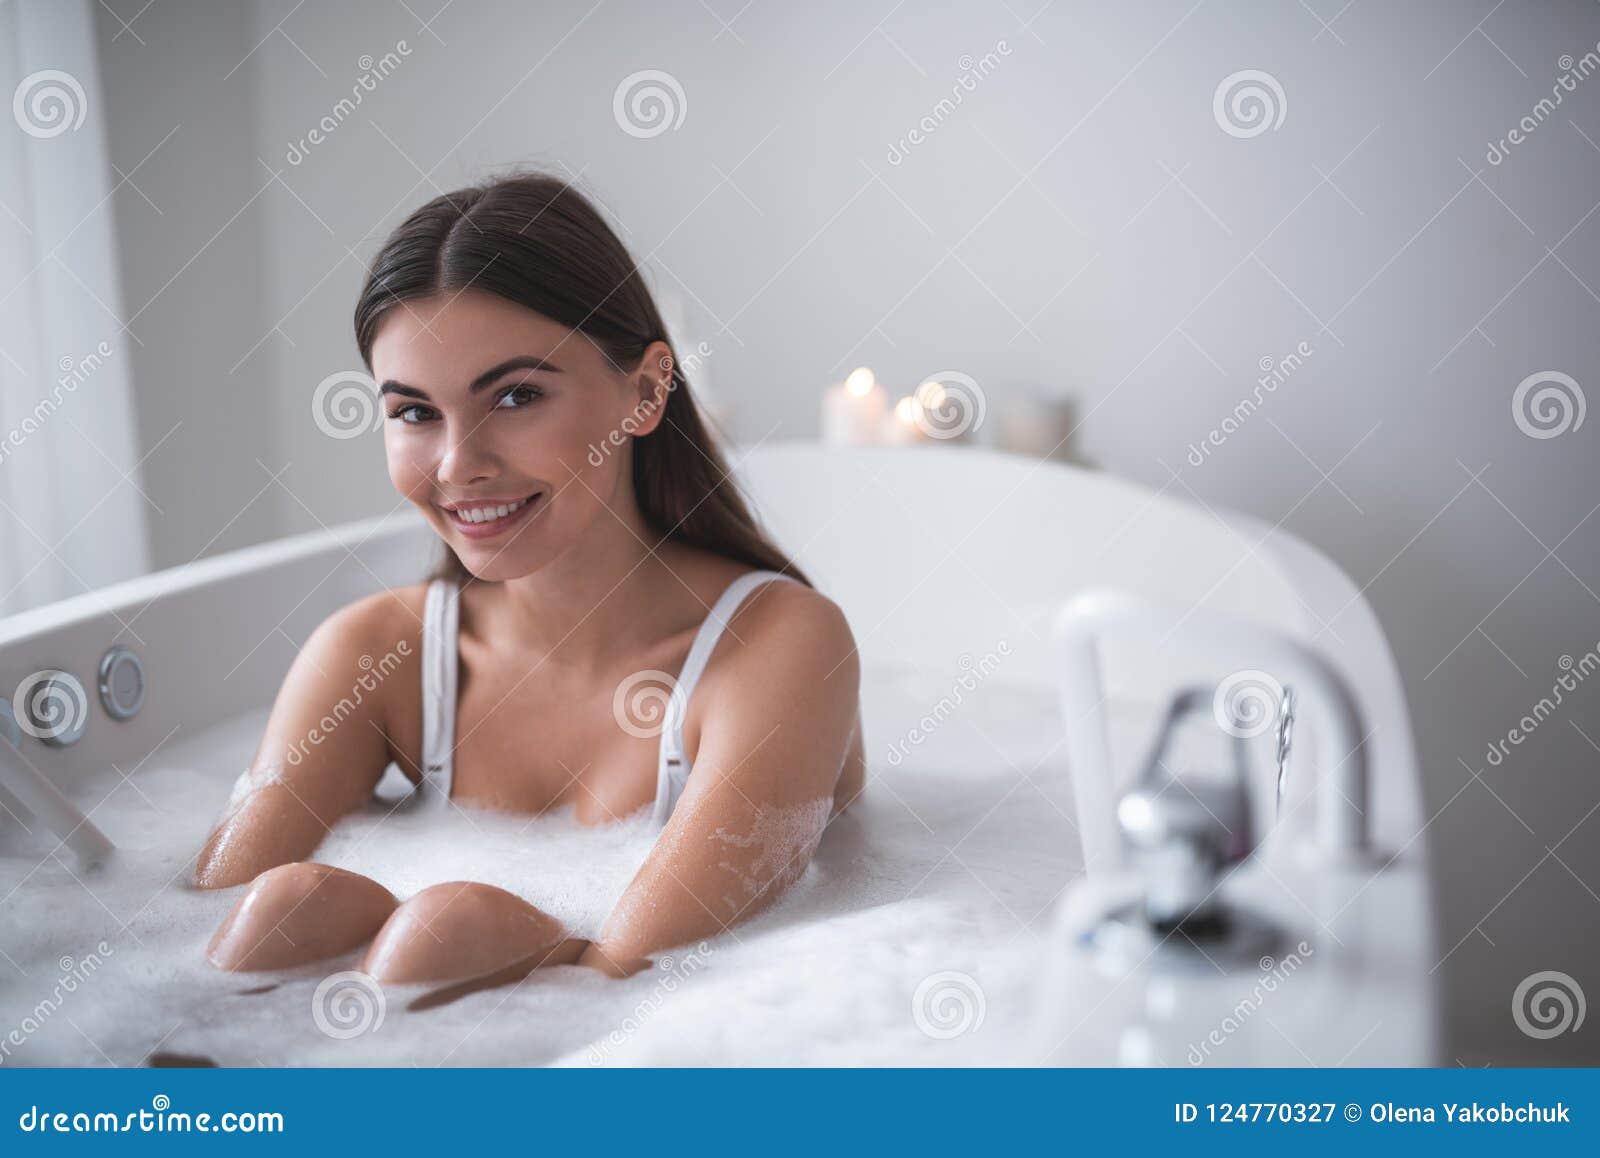 Bi couples and boy porn video